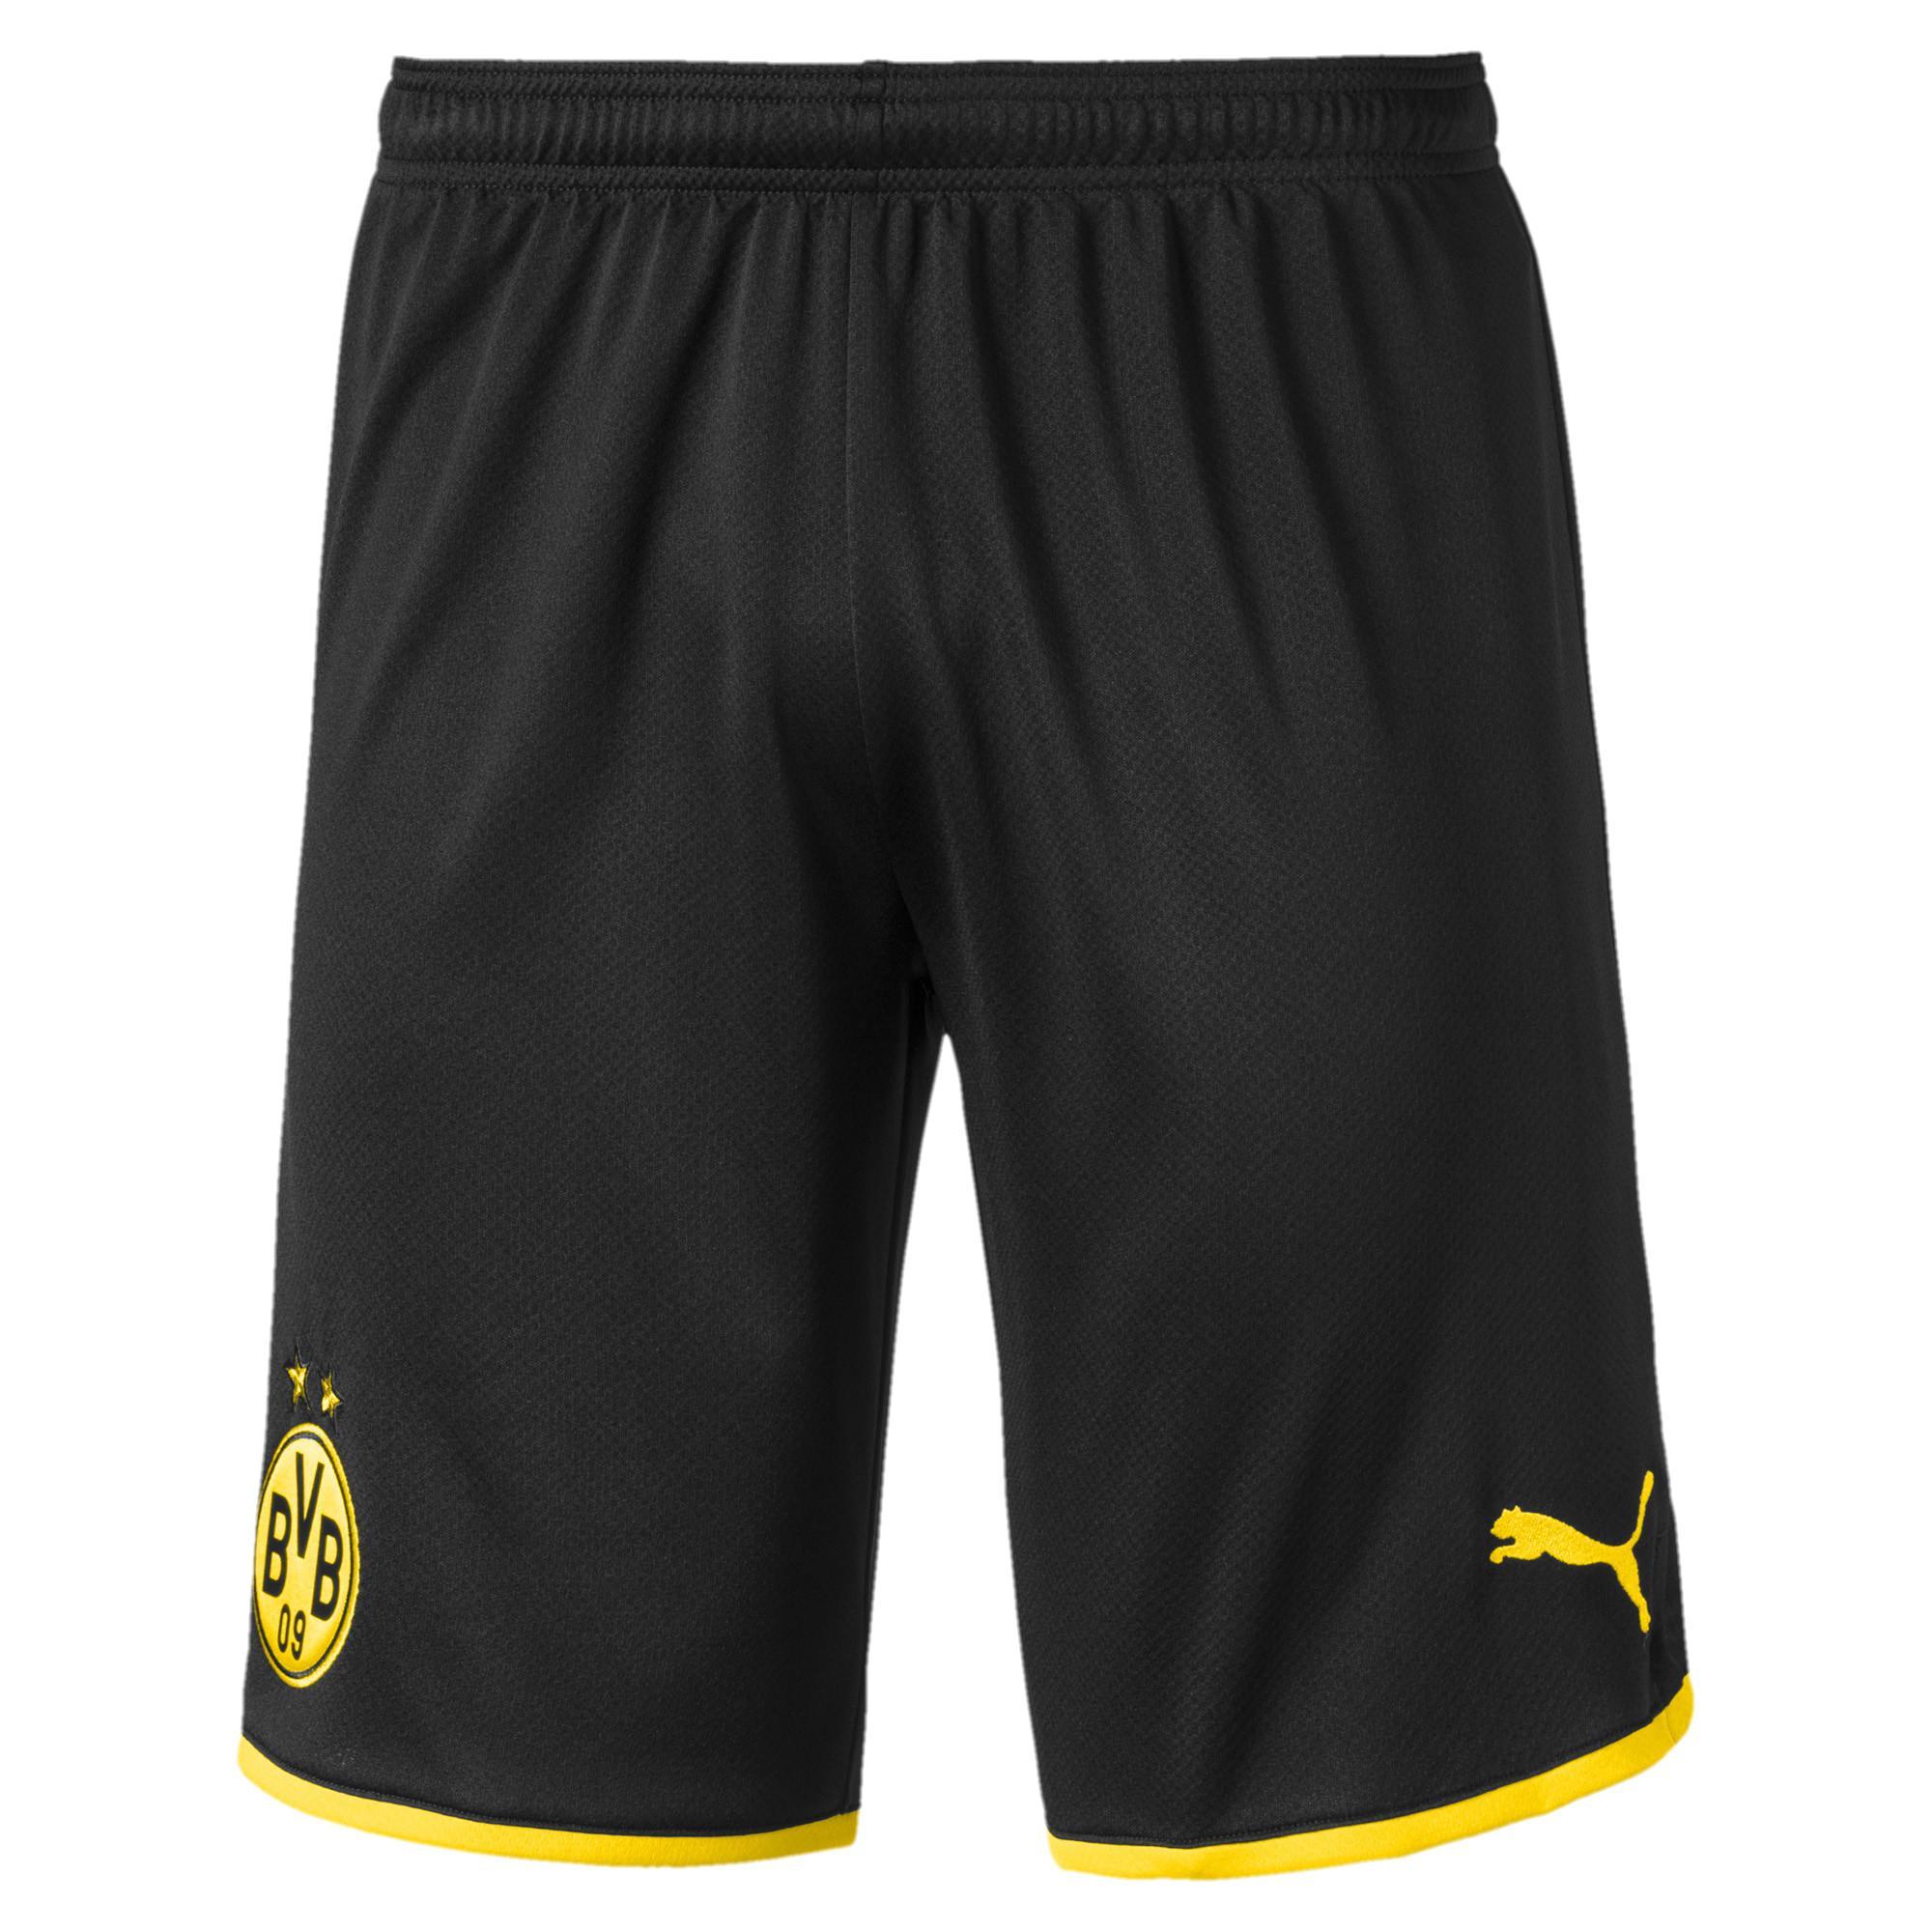 Puma Pantaloncini Gara Home Borussia Dortmund   19/20